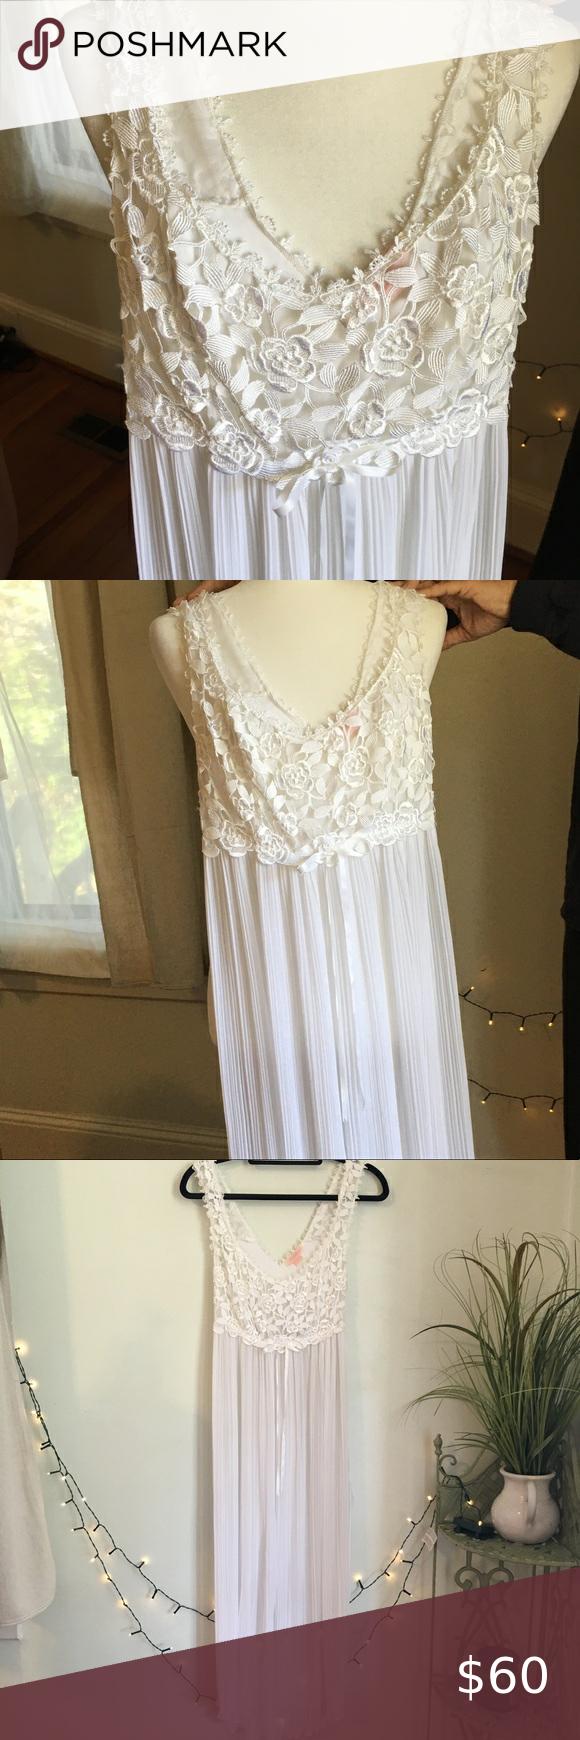 Vintage White Lace Pleated Nighty Slip Dress Lace Slip Dress White Lace Dresses [ 1740 x 580 Pixel ]